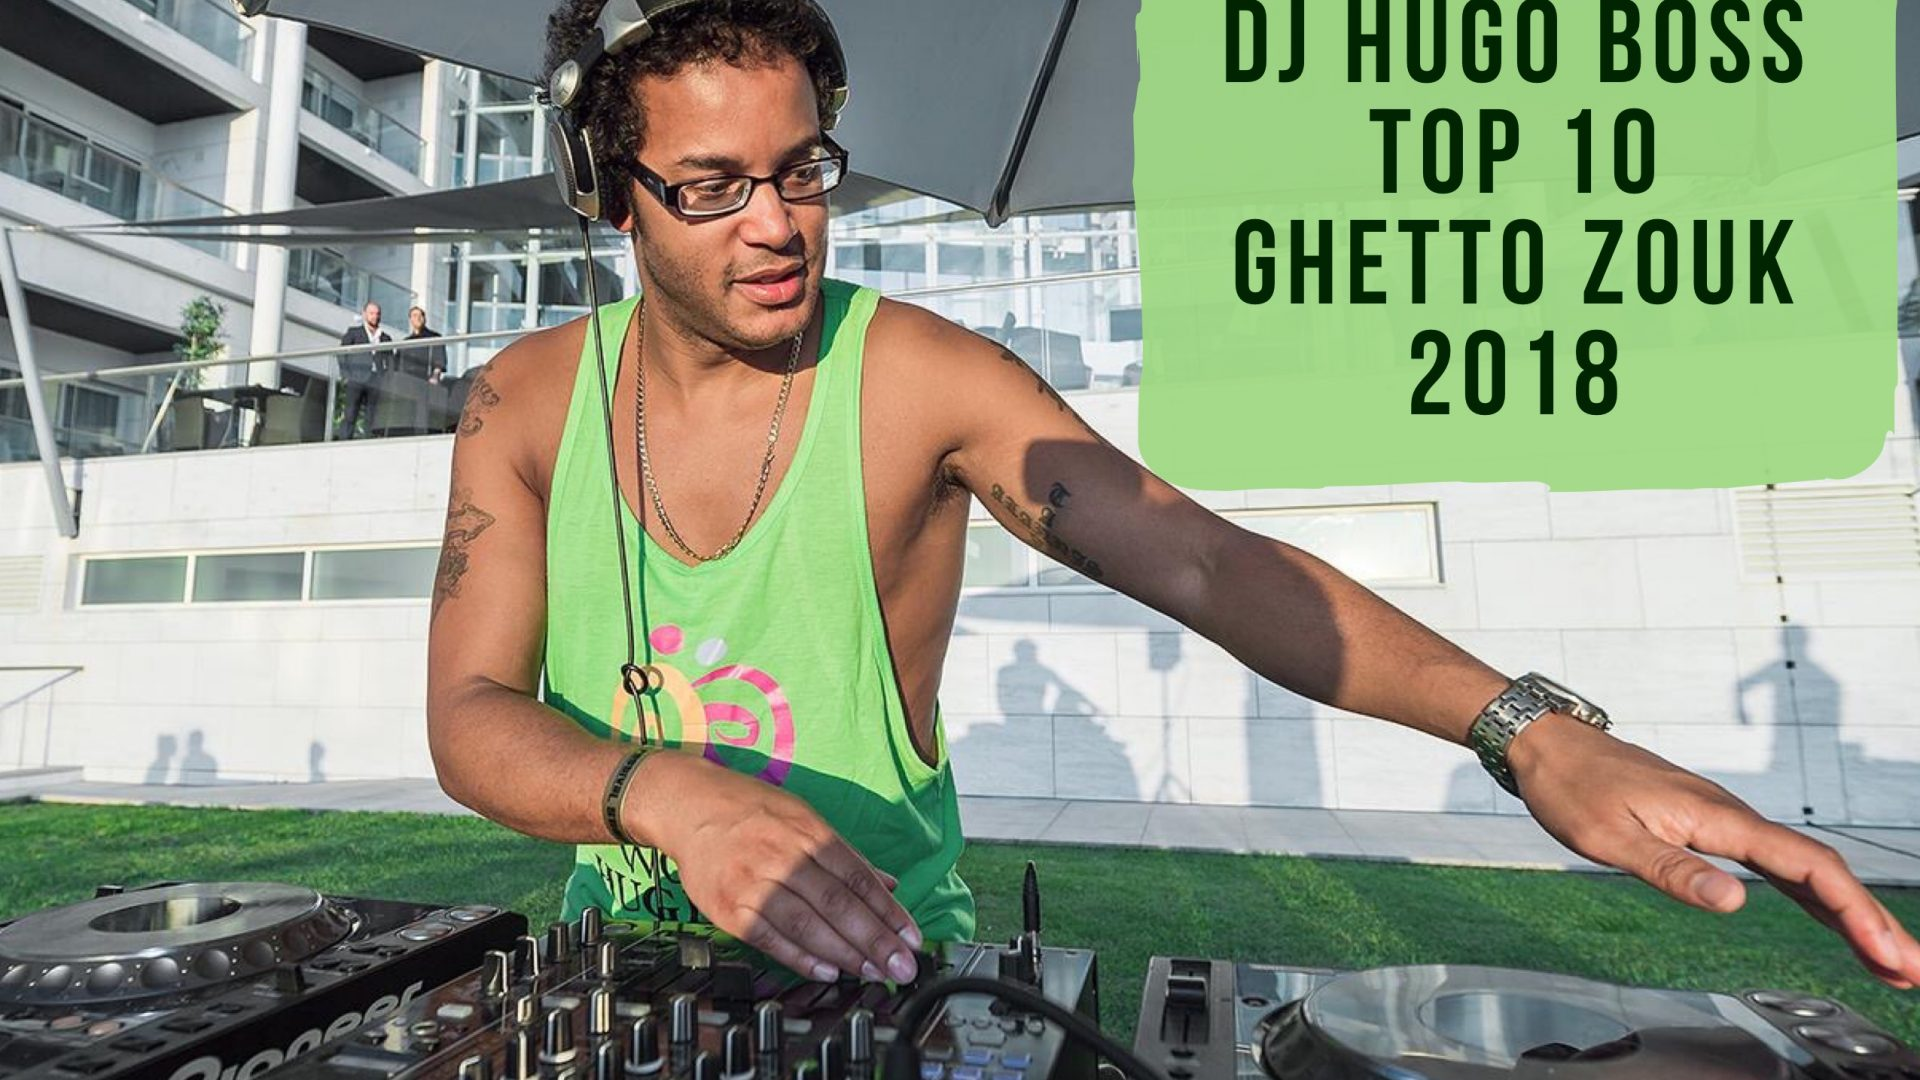 DJ HUGO BOSS TOP 10 GHETTO ZOUK SONGS OF 2018